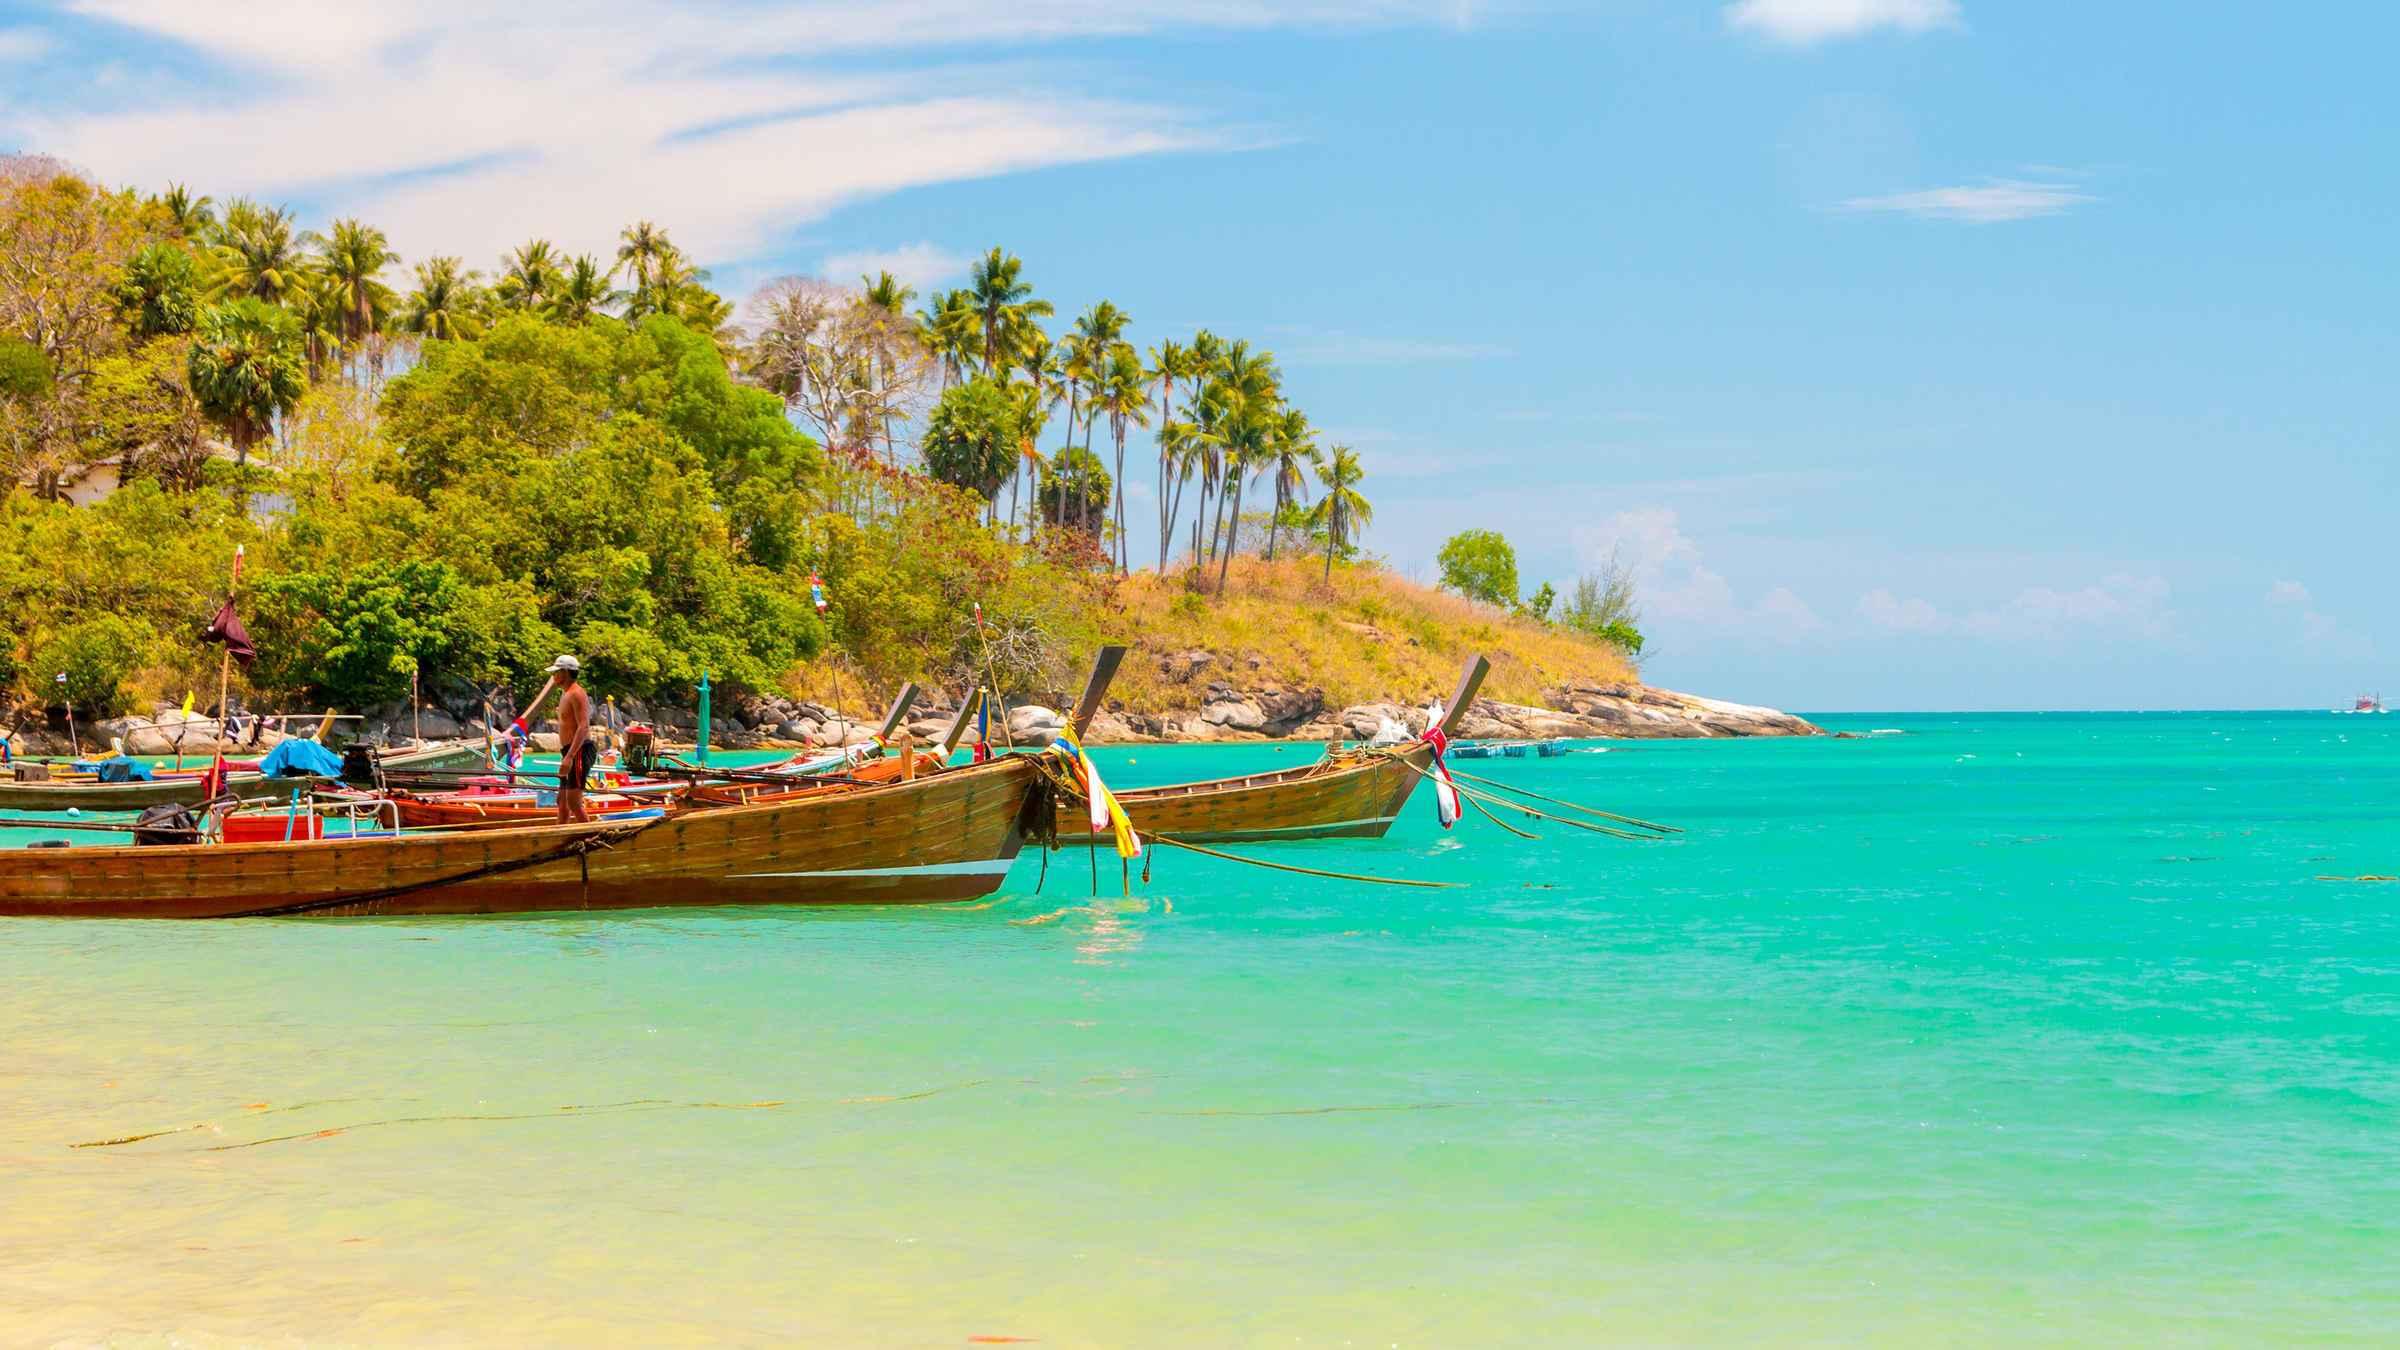 From Phuket: Phang Nga Bay Sunrise Tour by Speedboat & Canoe